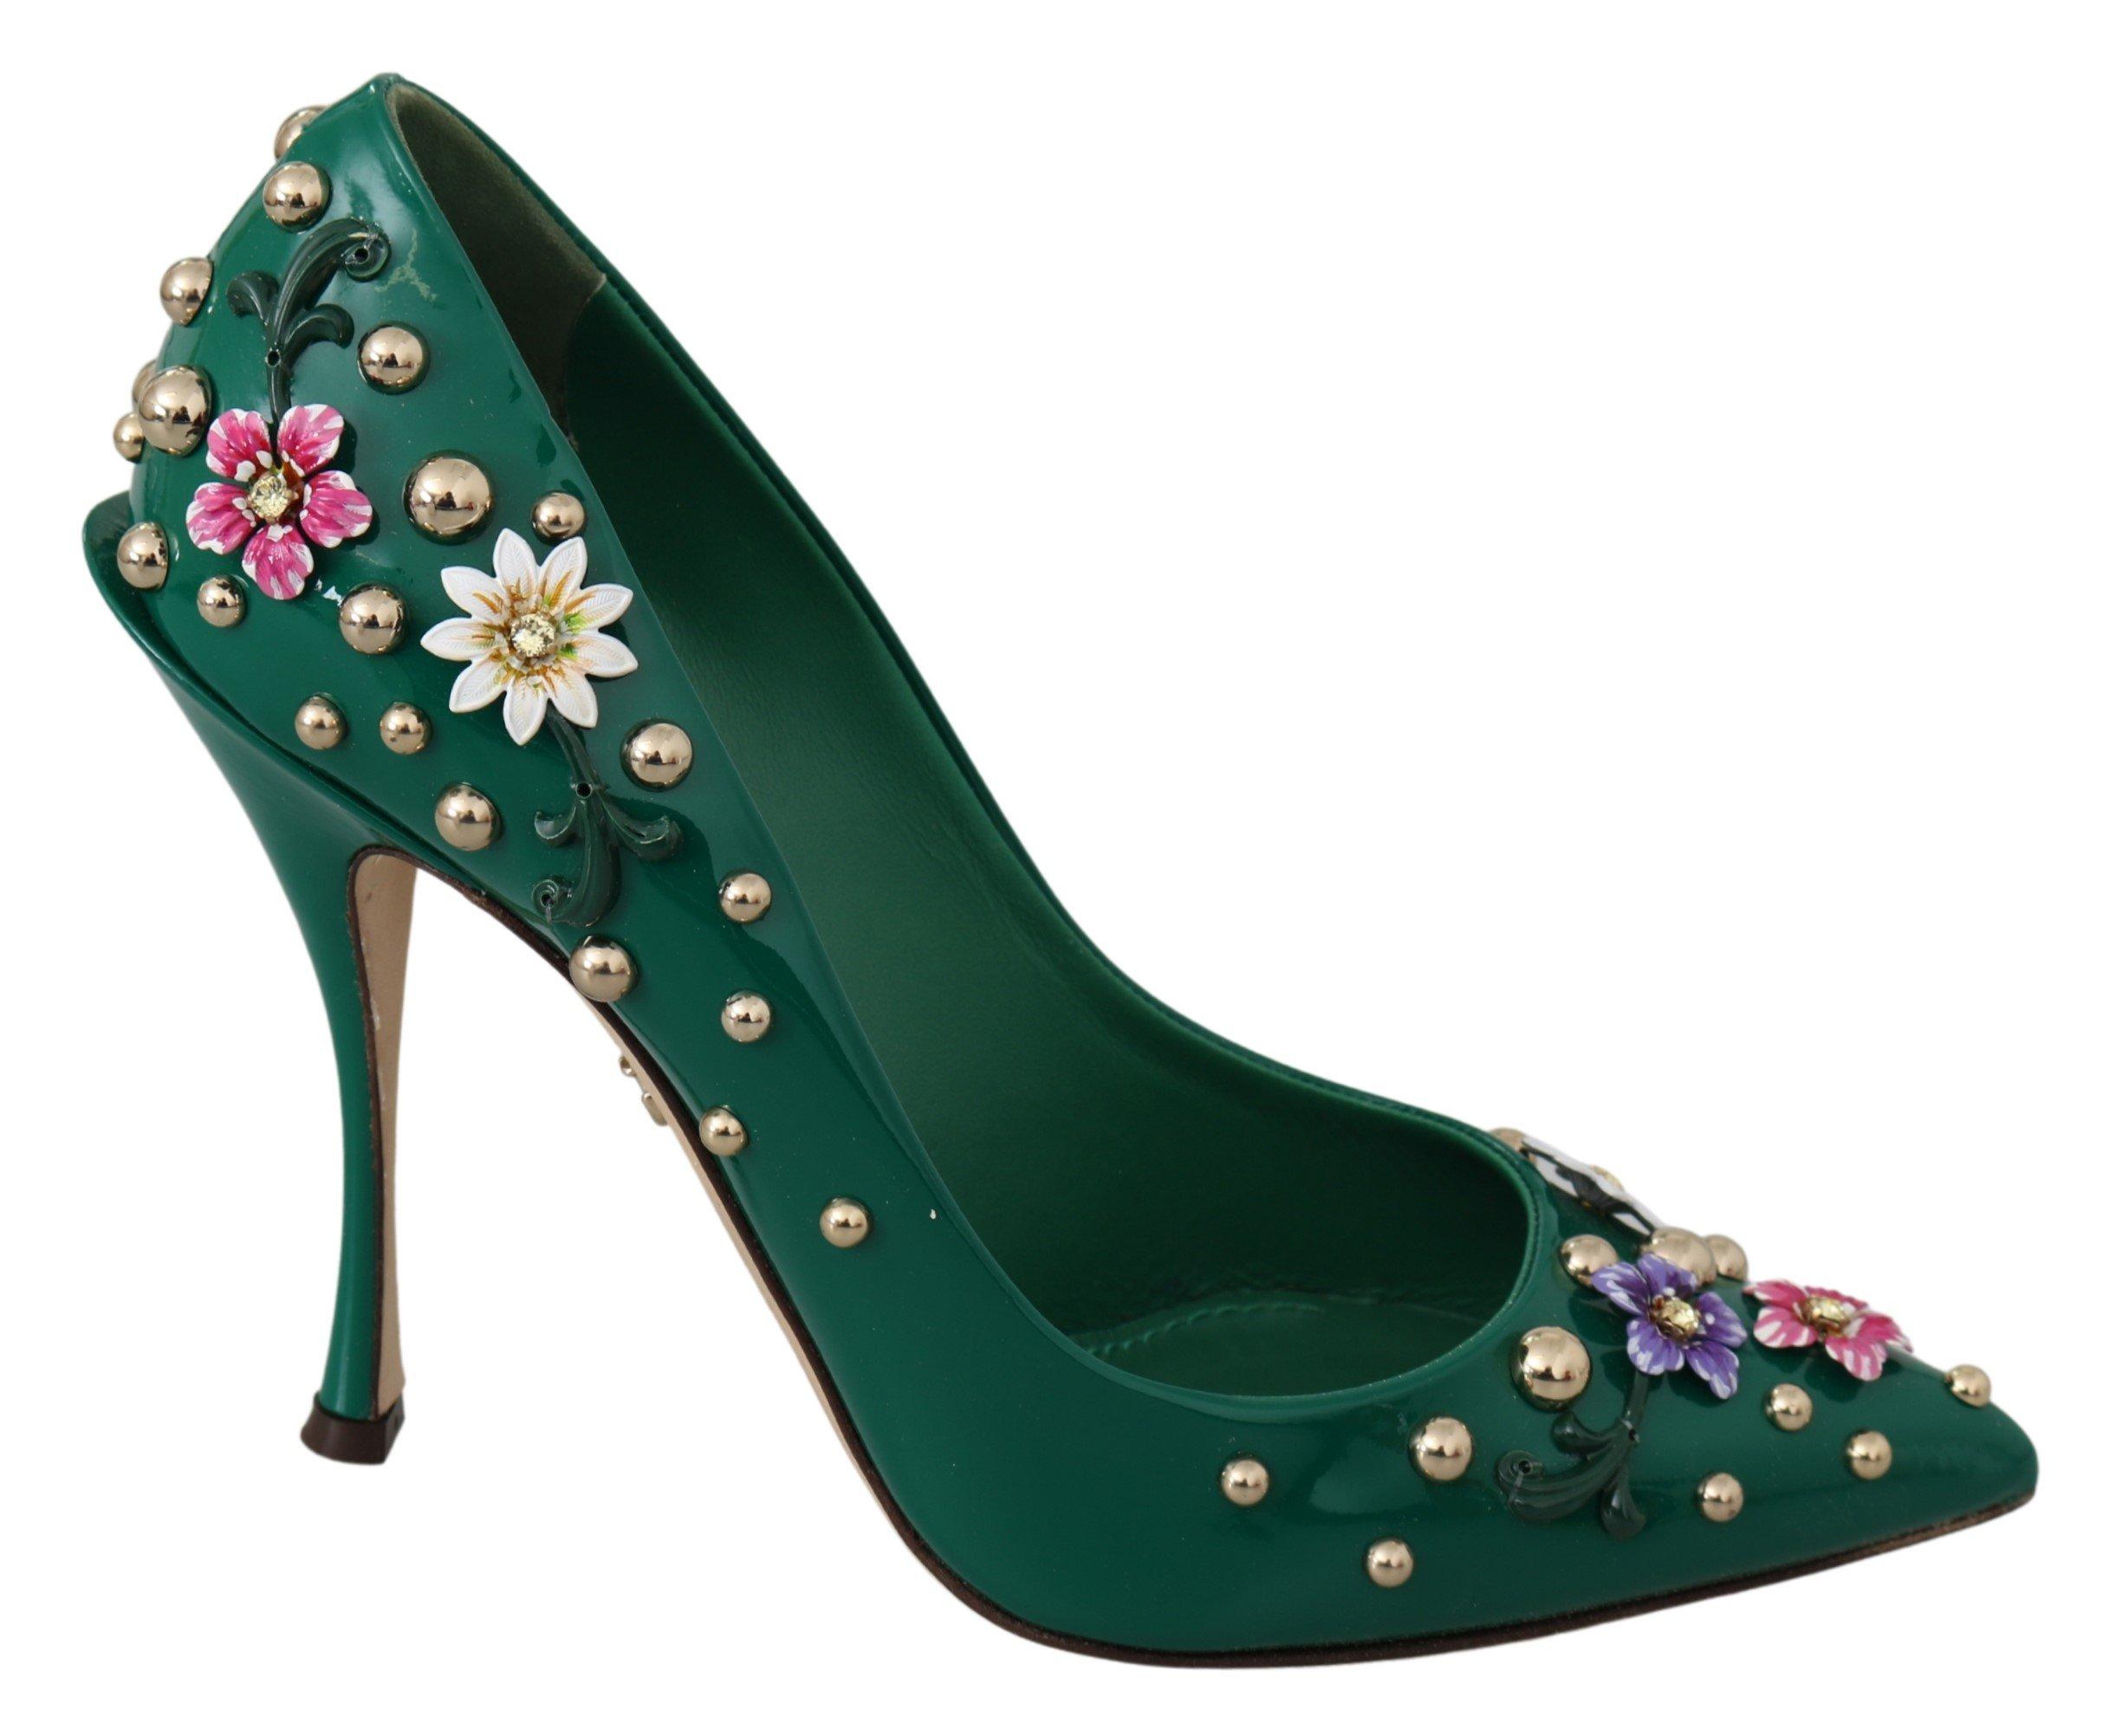 Dolce & Gabbana Women's Floral Crystal Leather Pumps Green LA6786 - EU39/US8.5